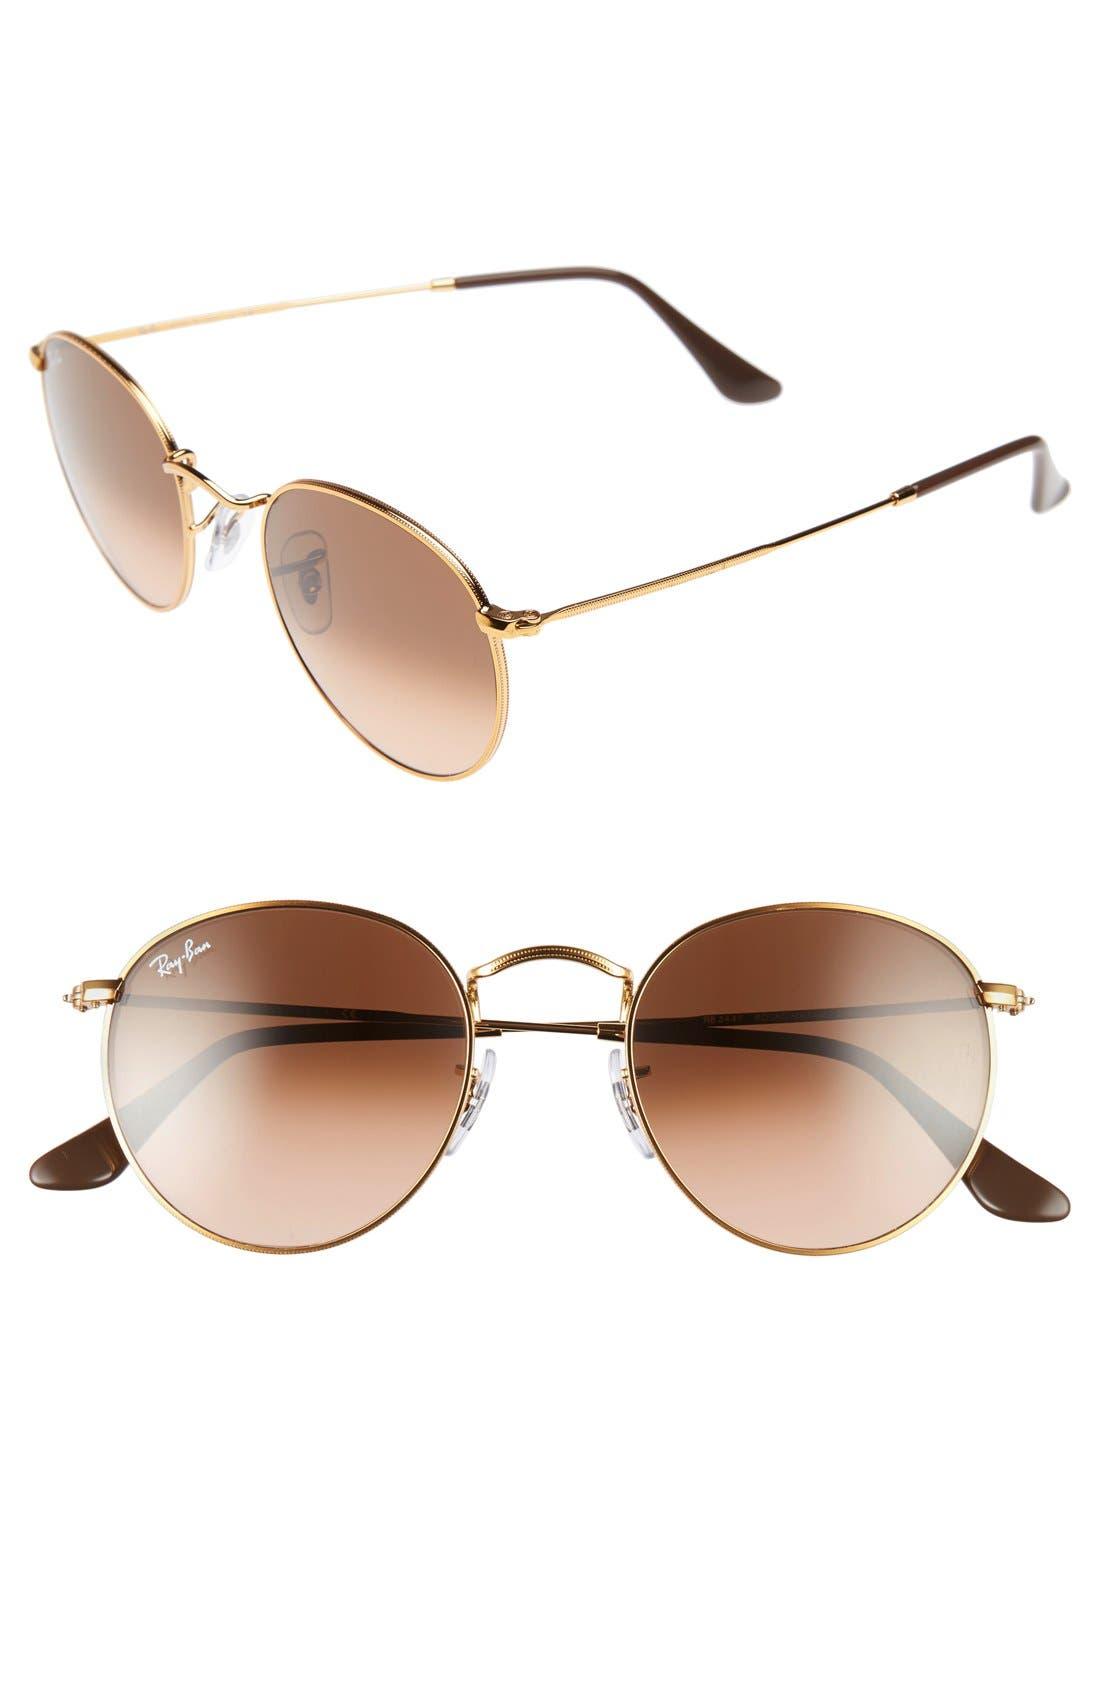 Icons 50mm Retro Sunglasses,                             Main thumbnail 3, color,